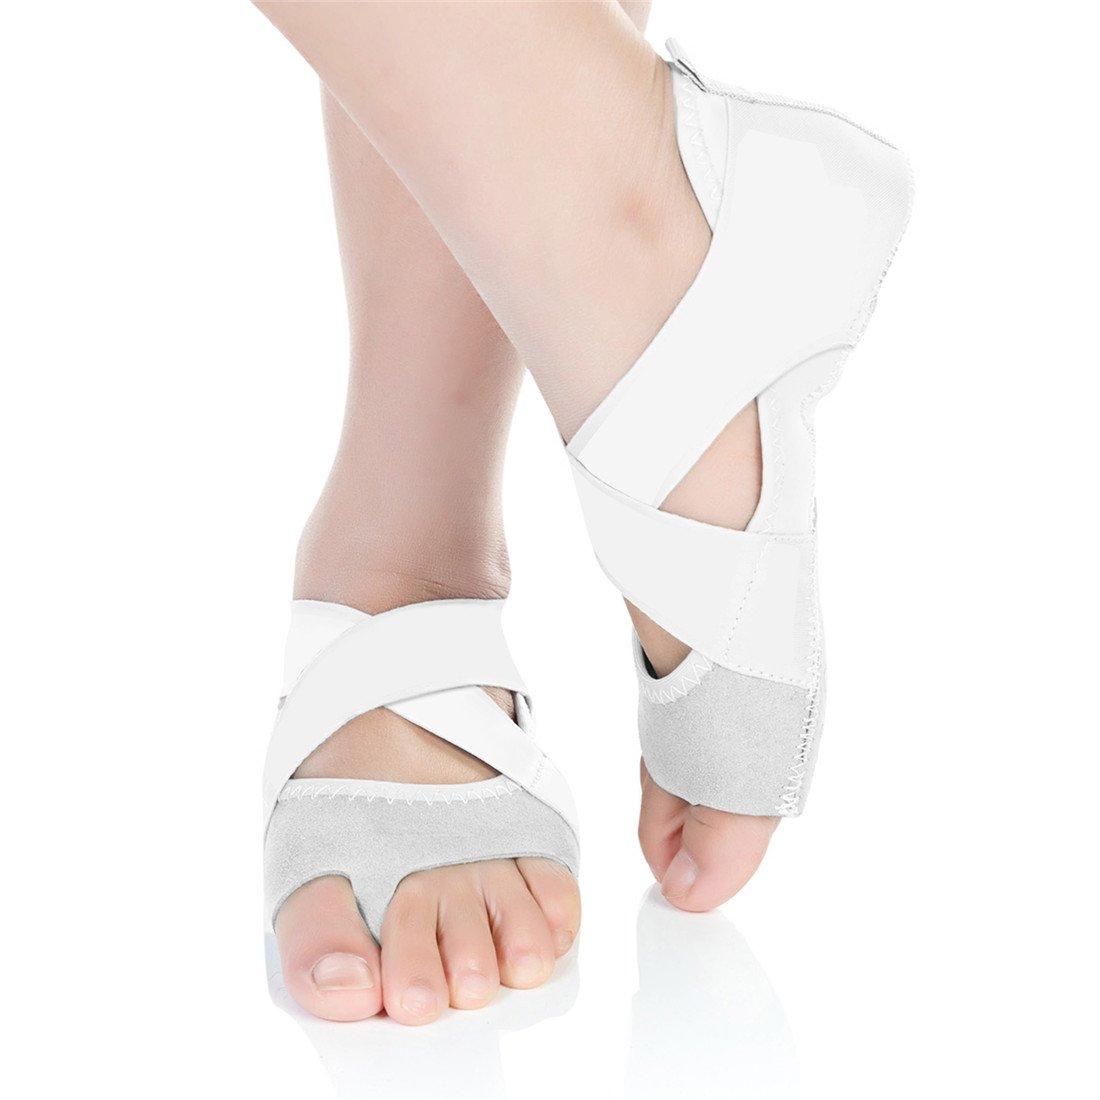 Barerun Ballet Shoes Grip Bare Toe Low Rise Non-Slip for Ballet Yoga Pilates Barre Toe Socks White 8.5-9.5 B(M) Women